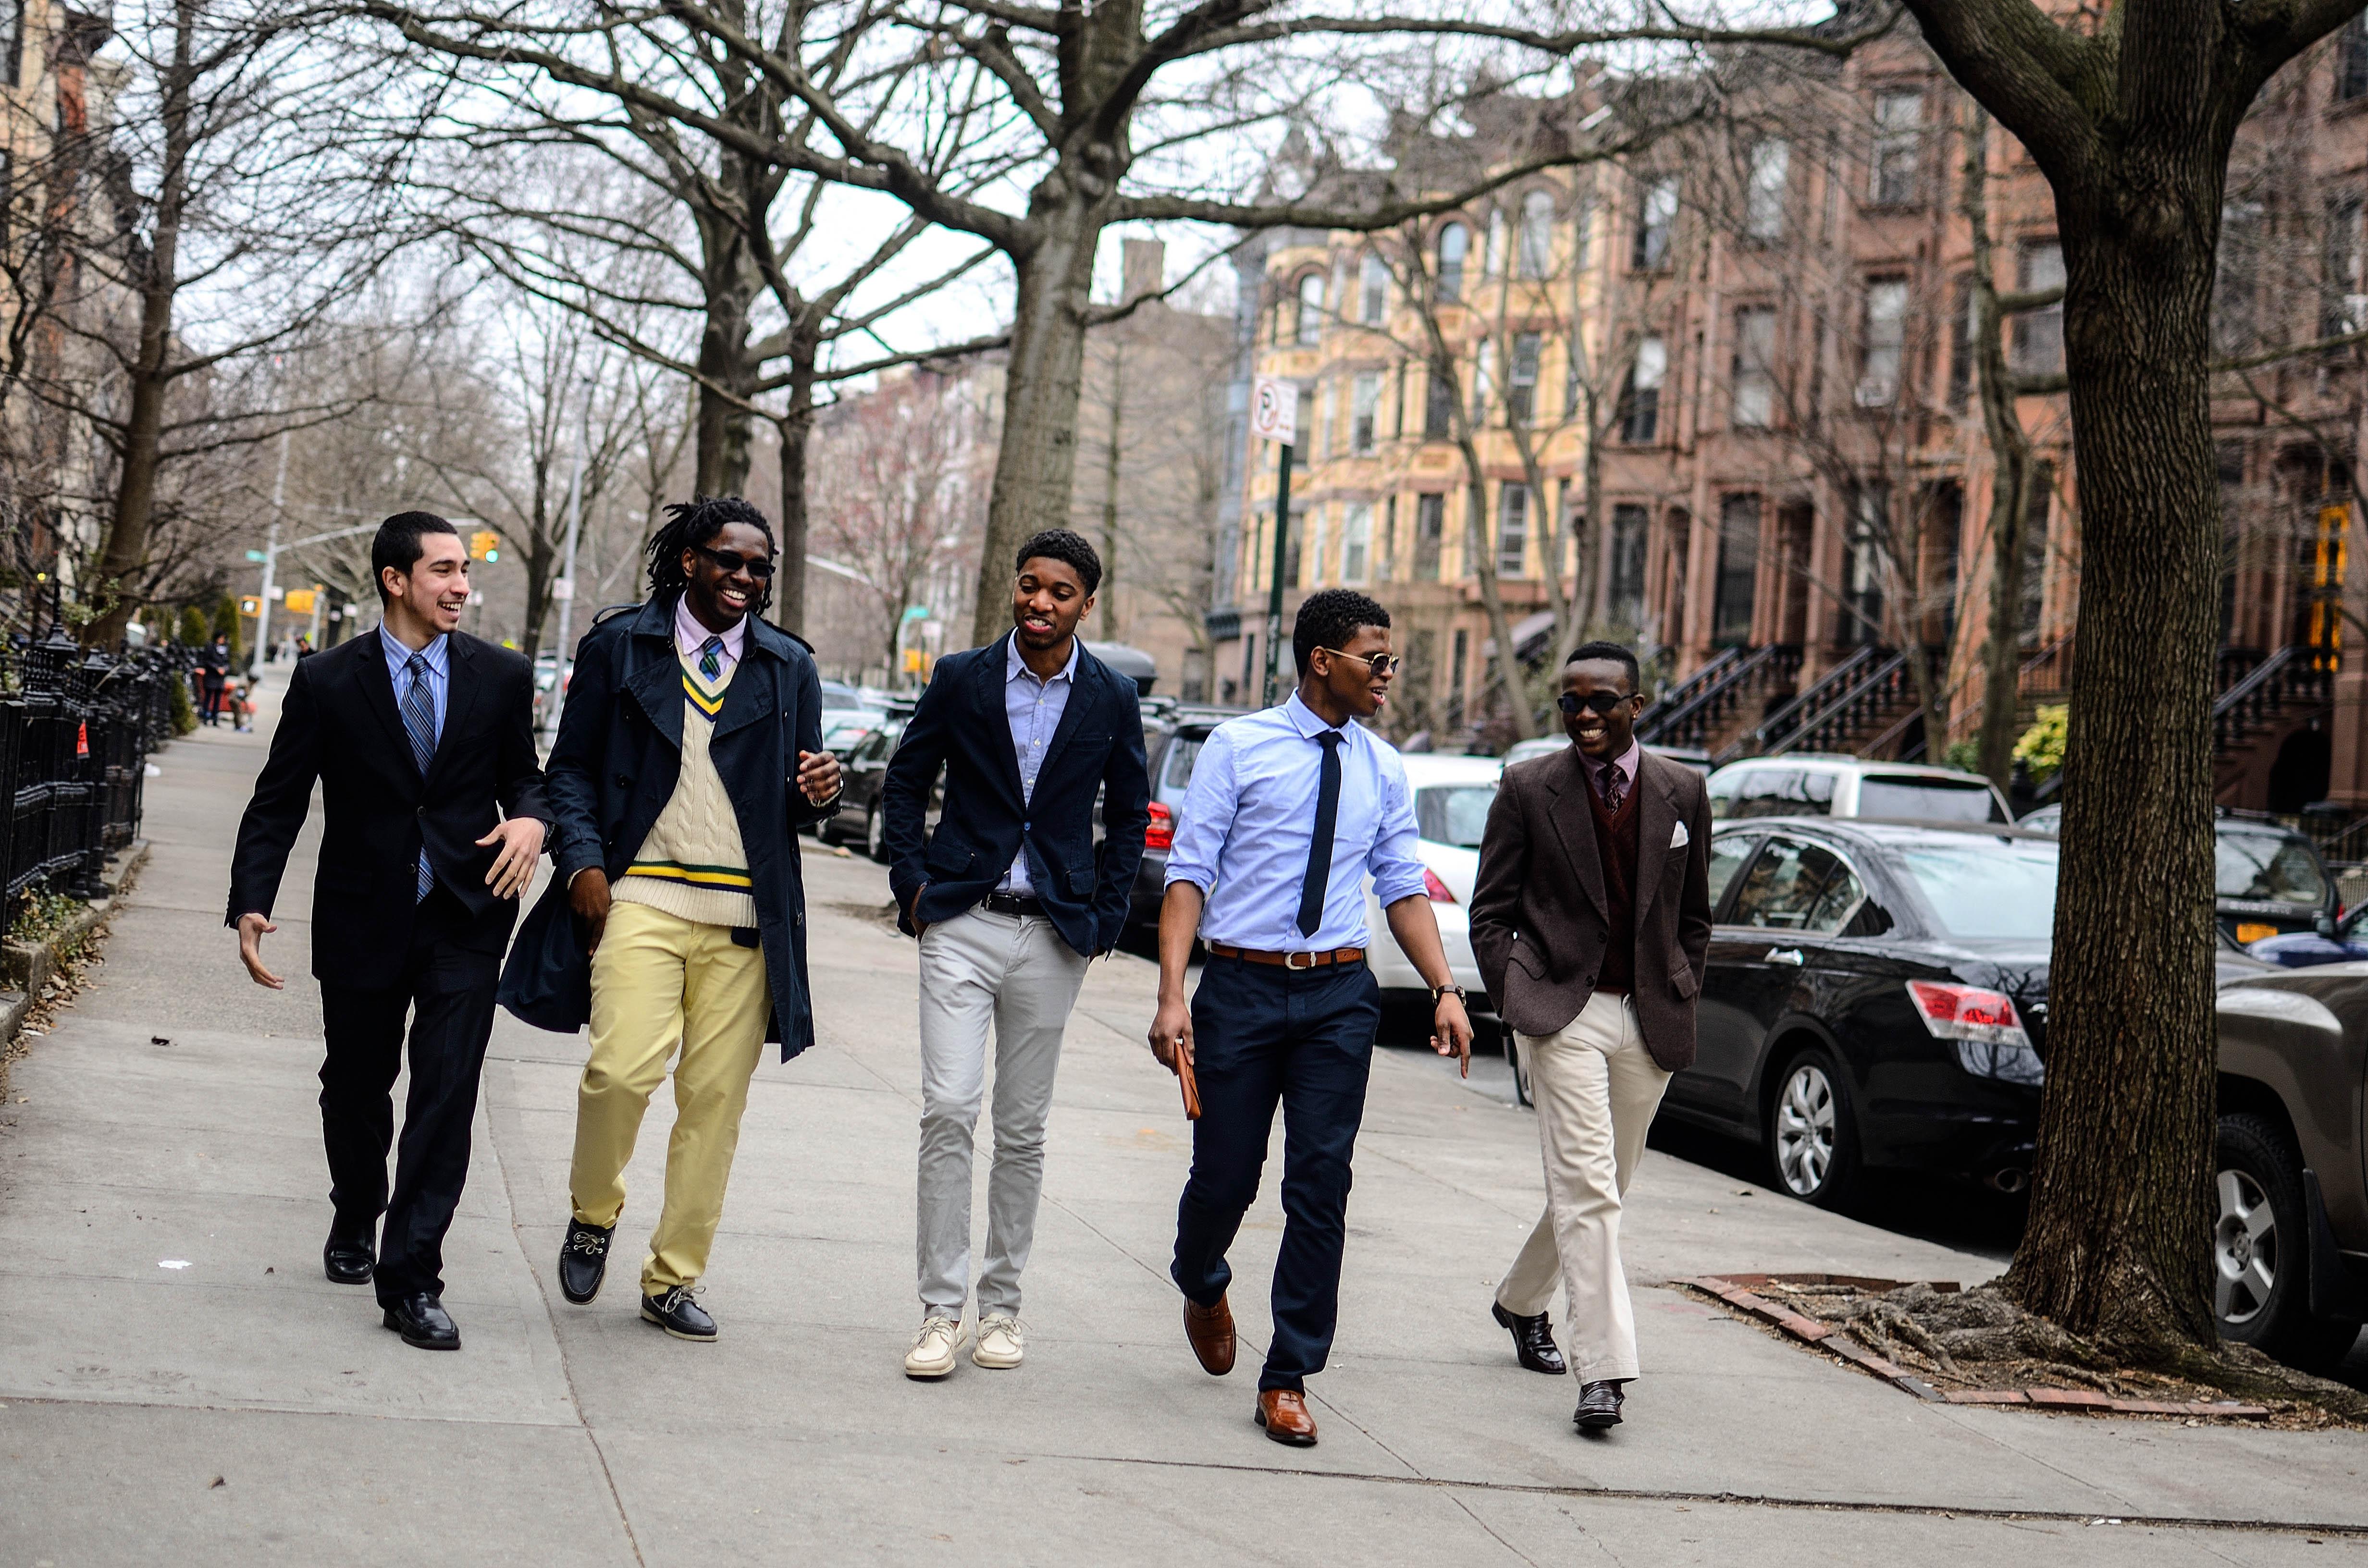 prep-boys-on-a-mission-streetstyle-2.jpg